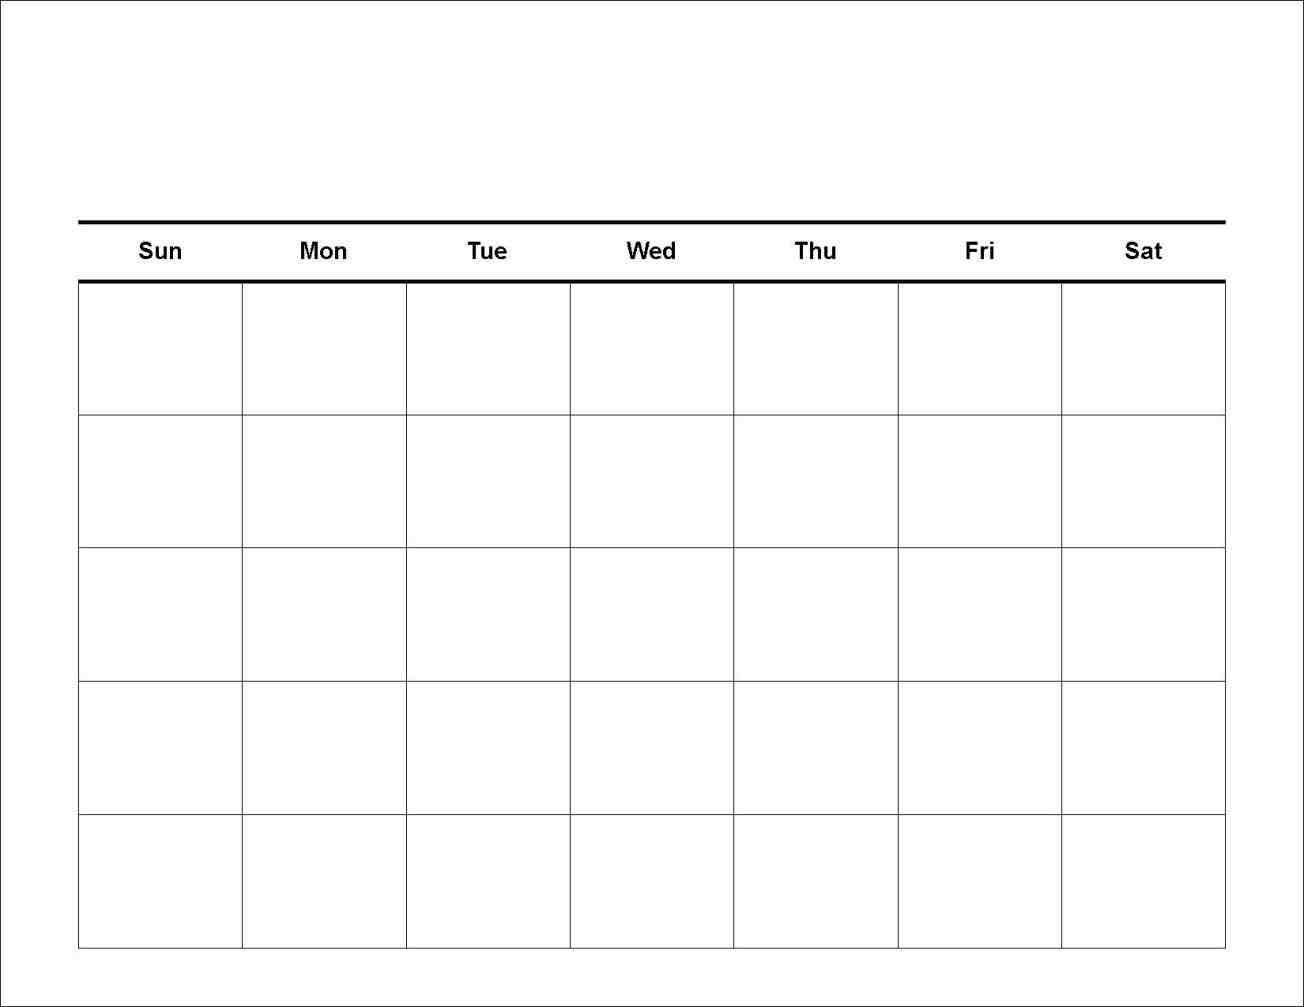 Single Day Calendar Blank Template | Calendar Template 2021  7 Day Printable Weekly Calanders